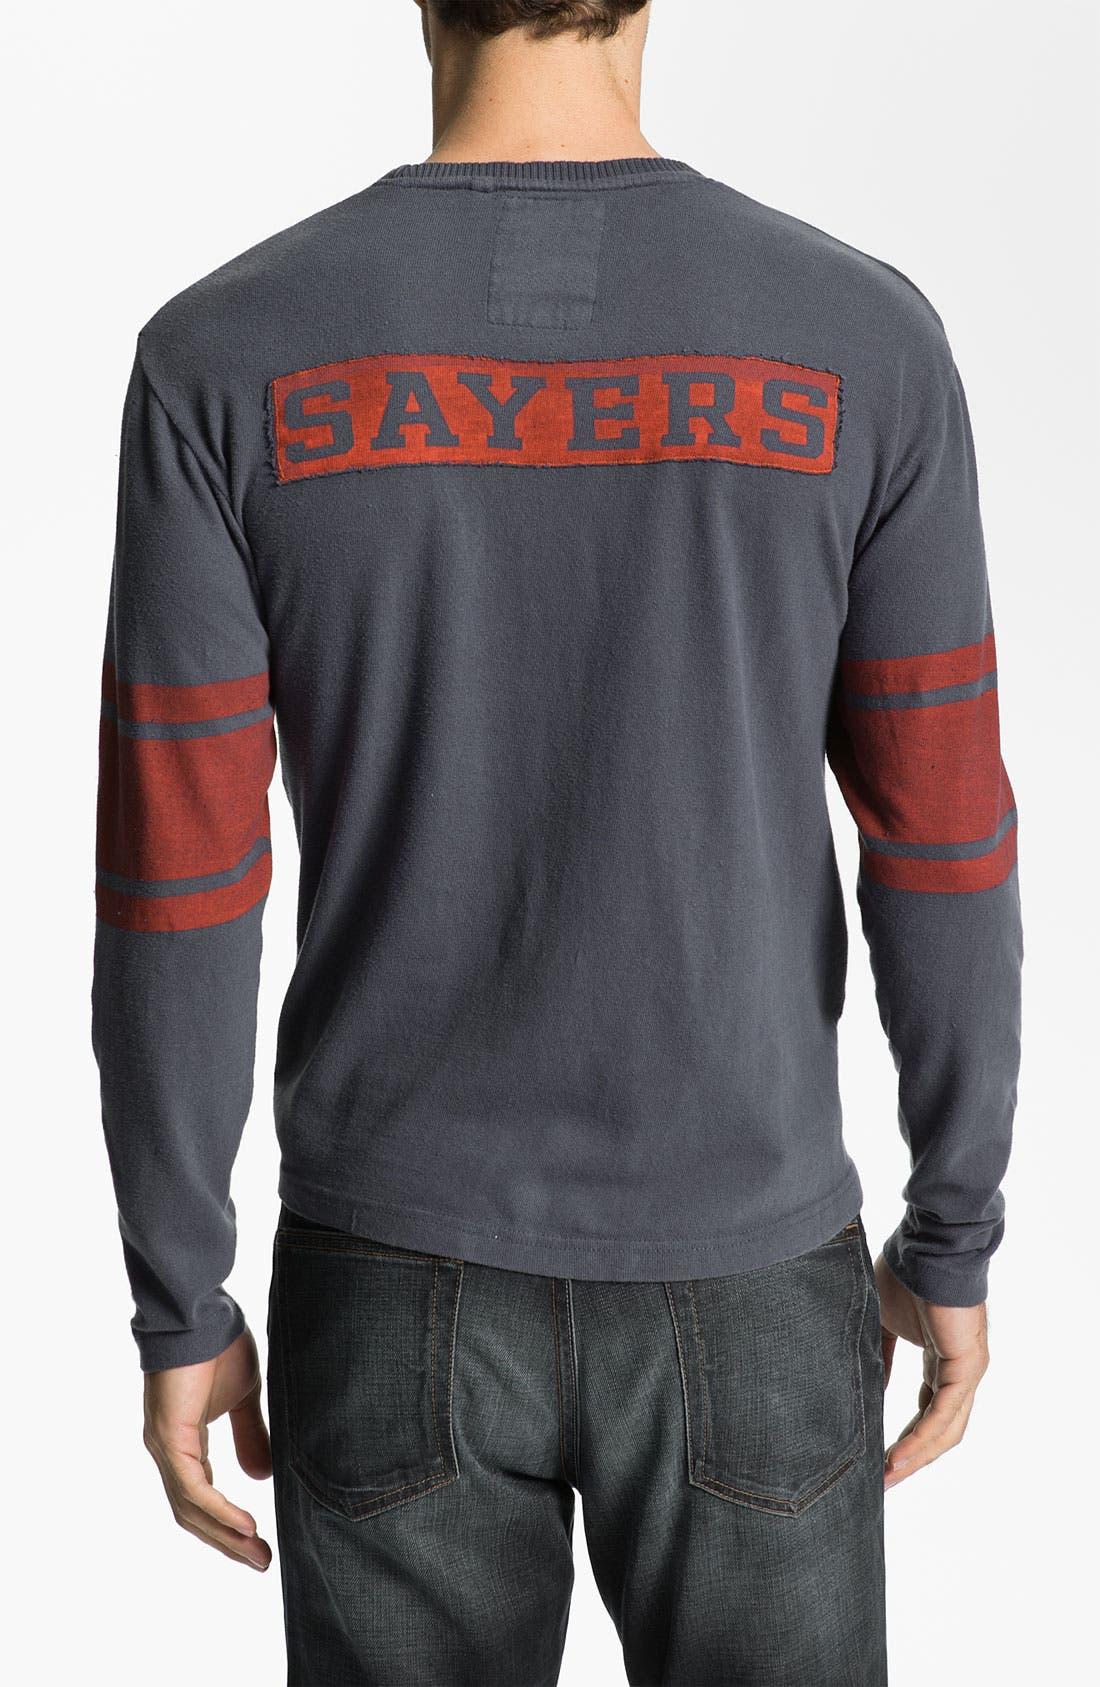 Alternate Image 2  - Red Jacket 'Gale Sayers - Bulldog' Long Sleeve T-Shirt